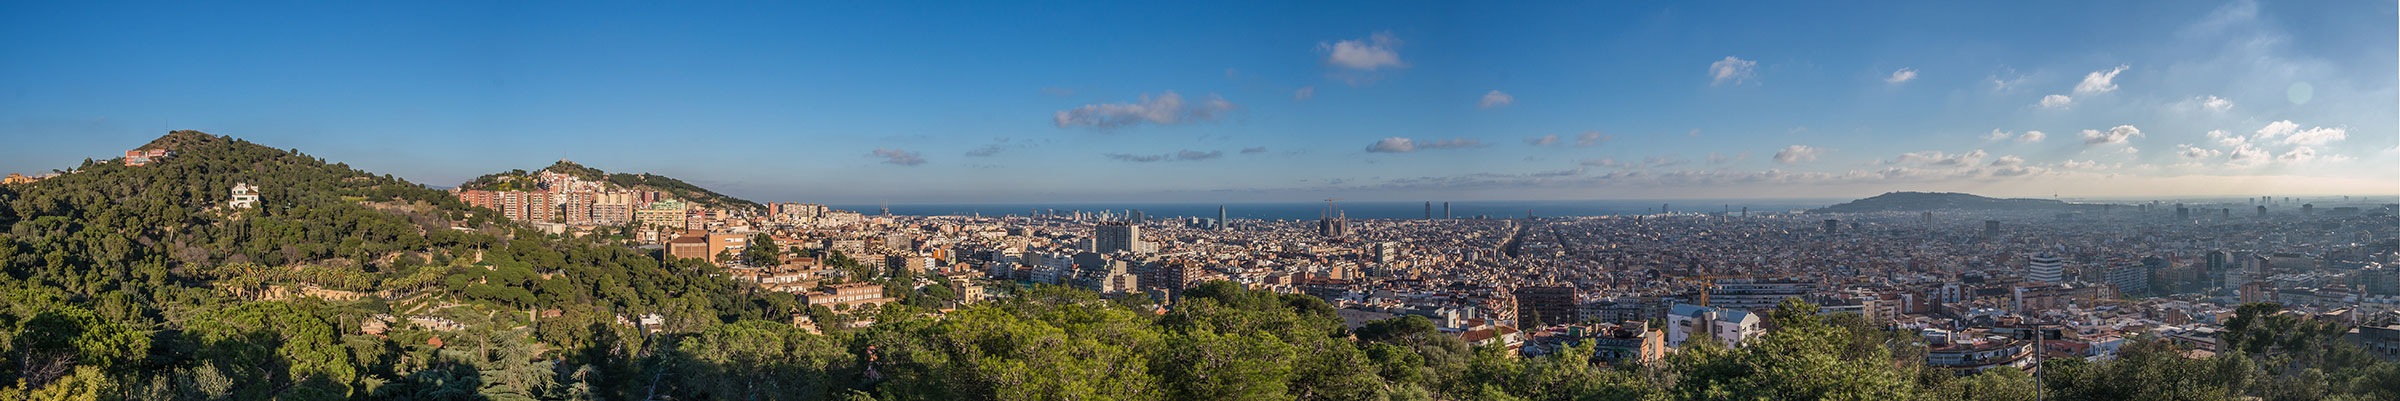 Barcelona - Stadtpanorama vom Park Güell aus